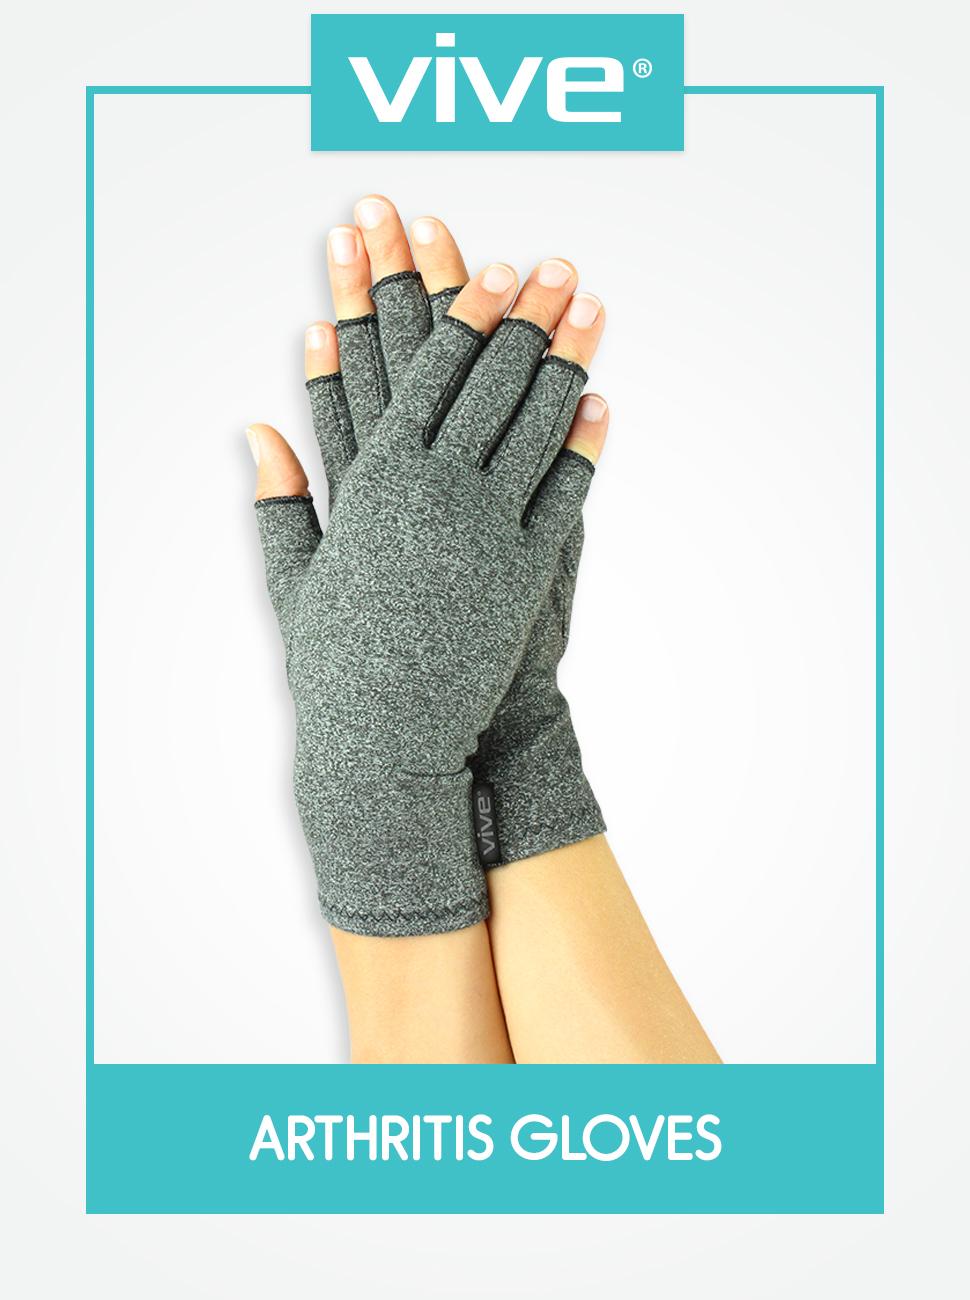 775B Arthritis Gloves Gray 3 Size Riding Glove Glove Health Care Effective